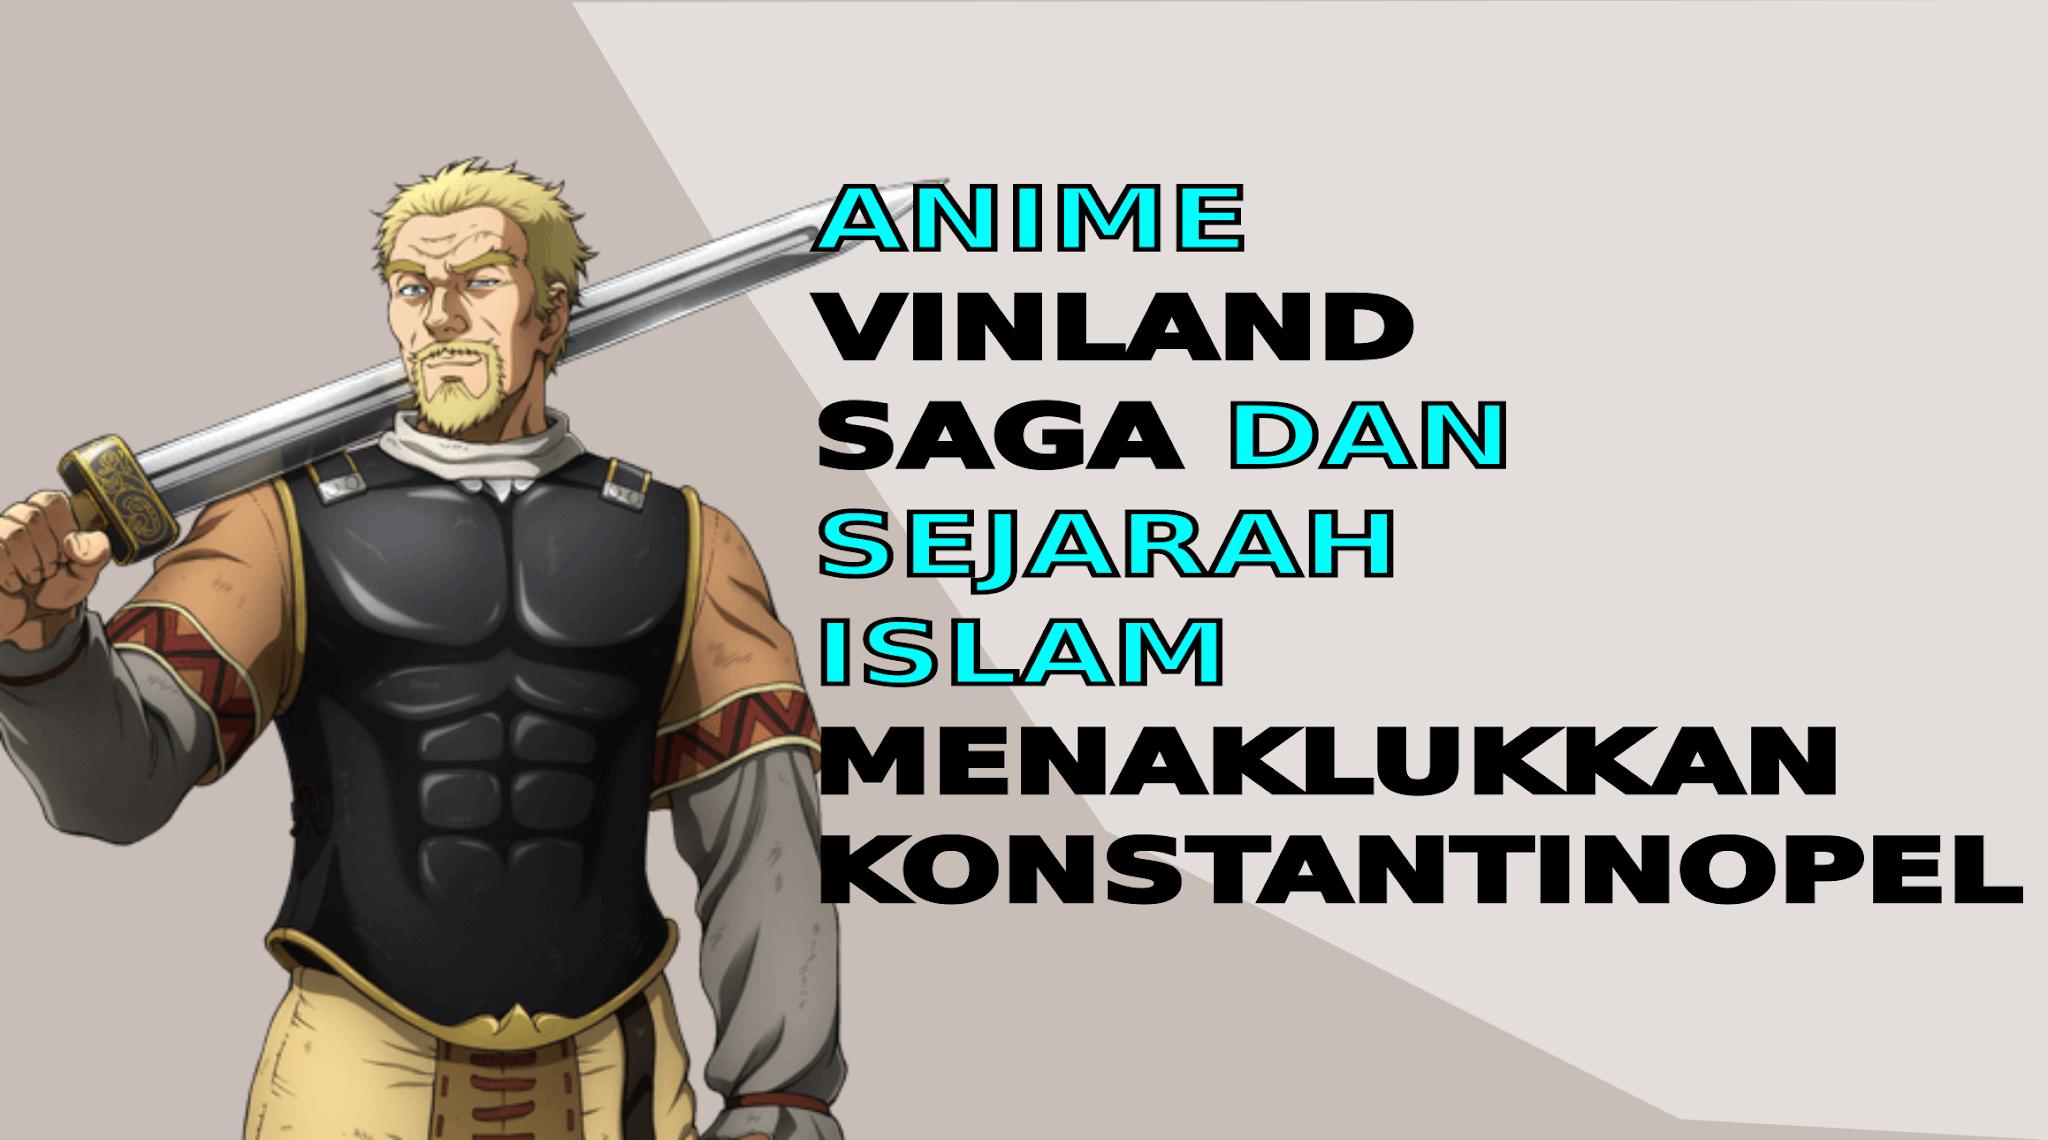 Anime Vinland Saga dan Sejarah Islam menaklukkan Konstantinopel